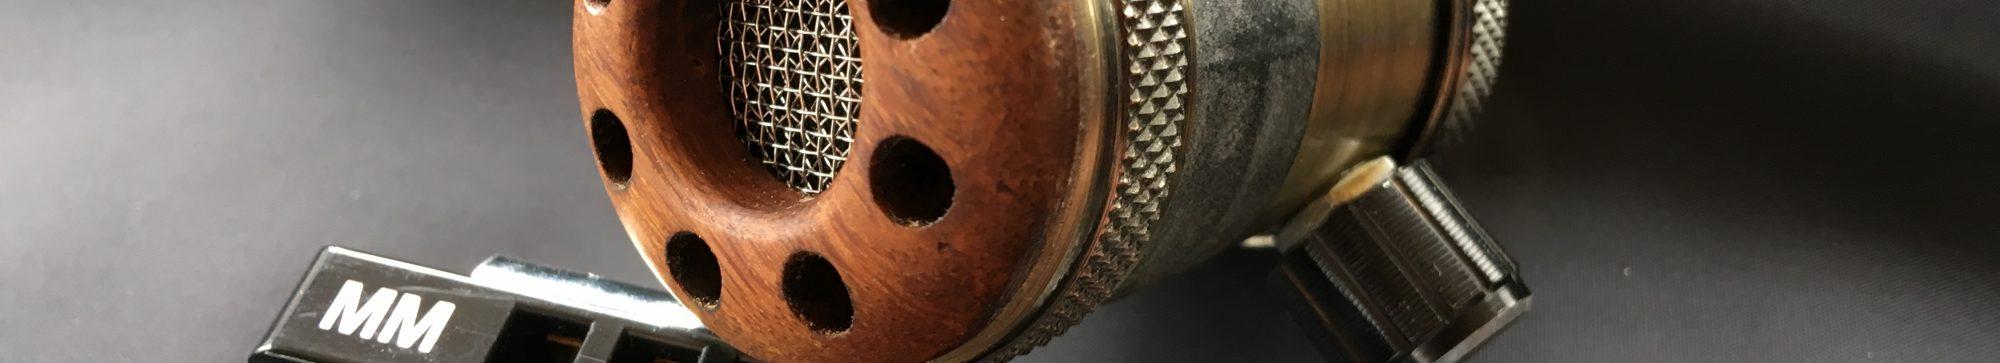 Silverfish harmonica microphones